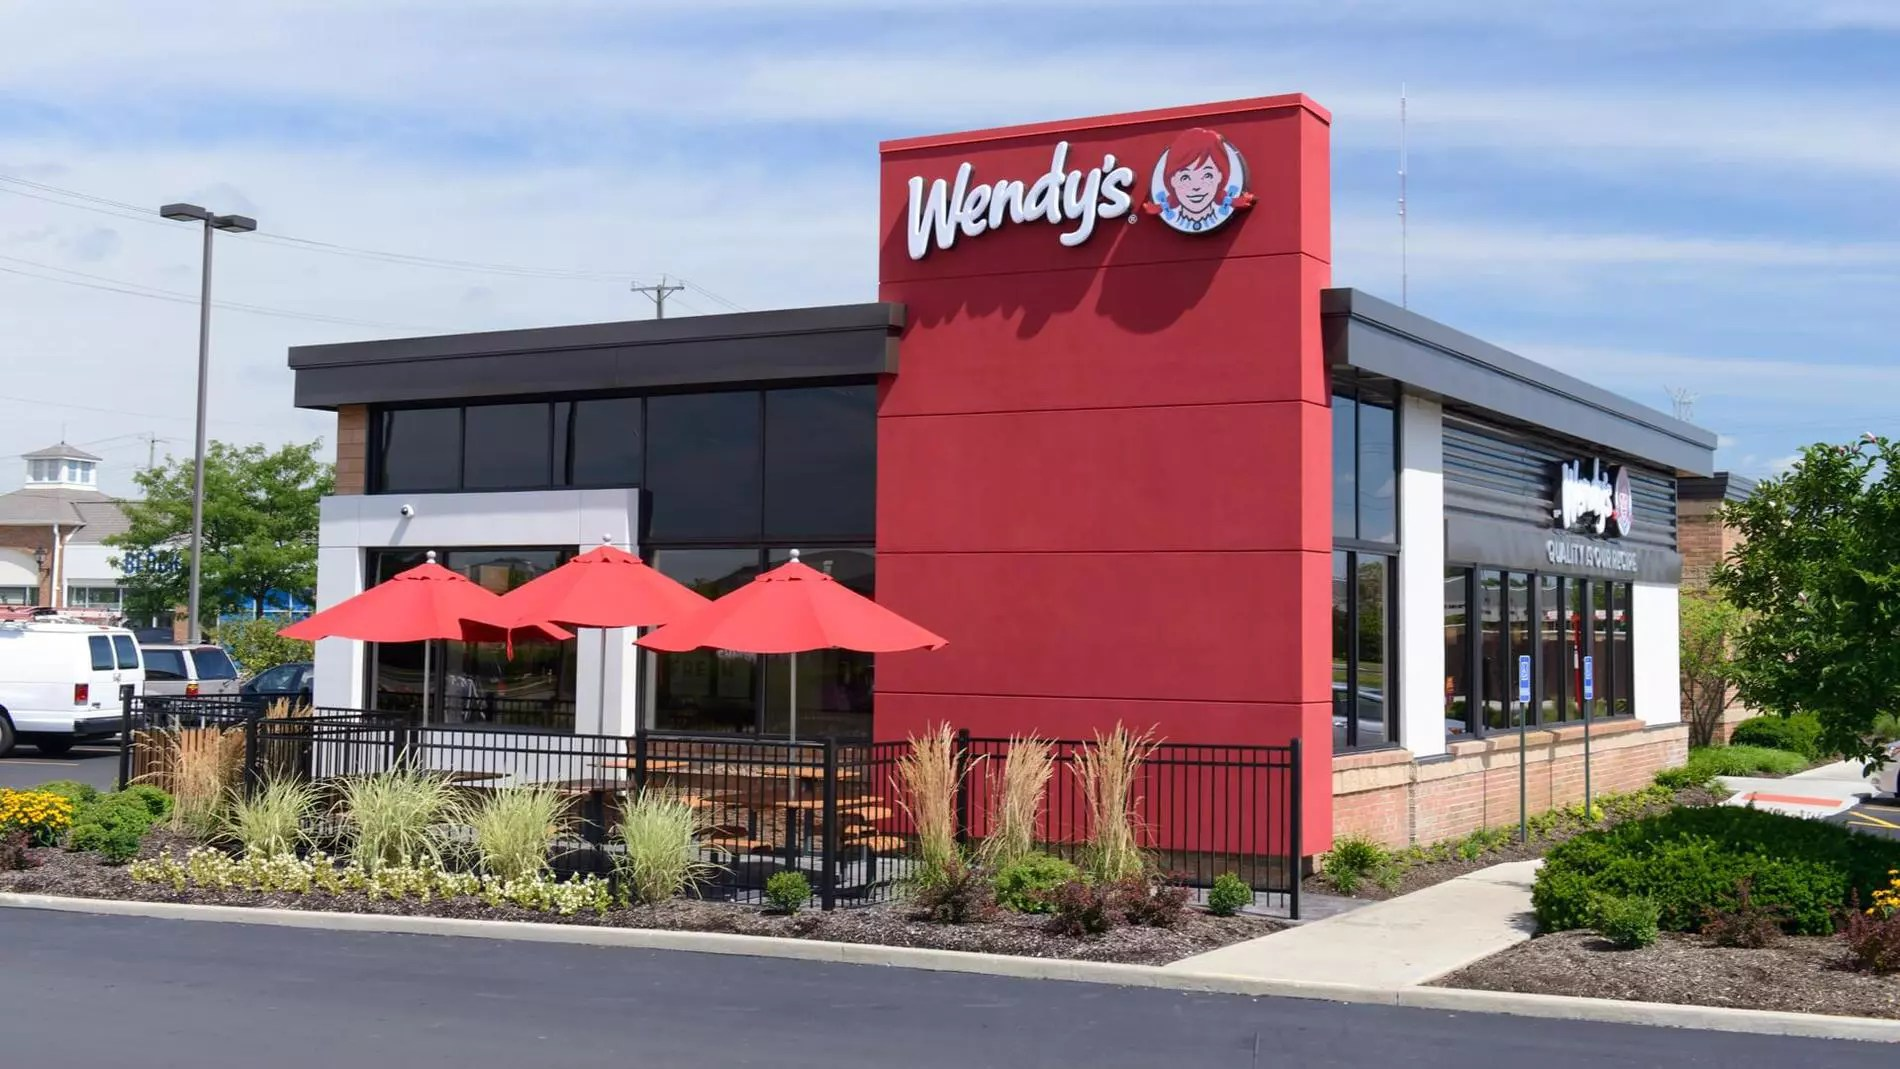 Fullsize Of Wendys Trex Burger